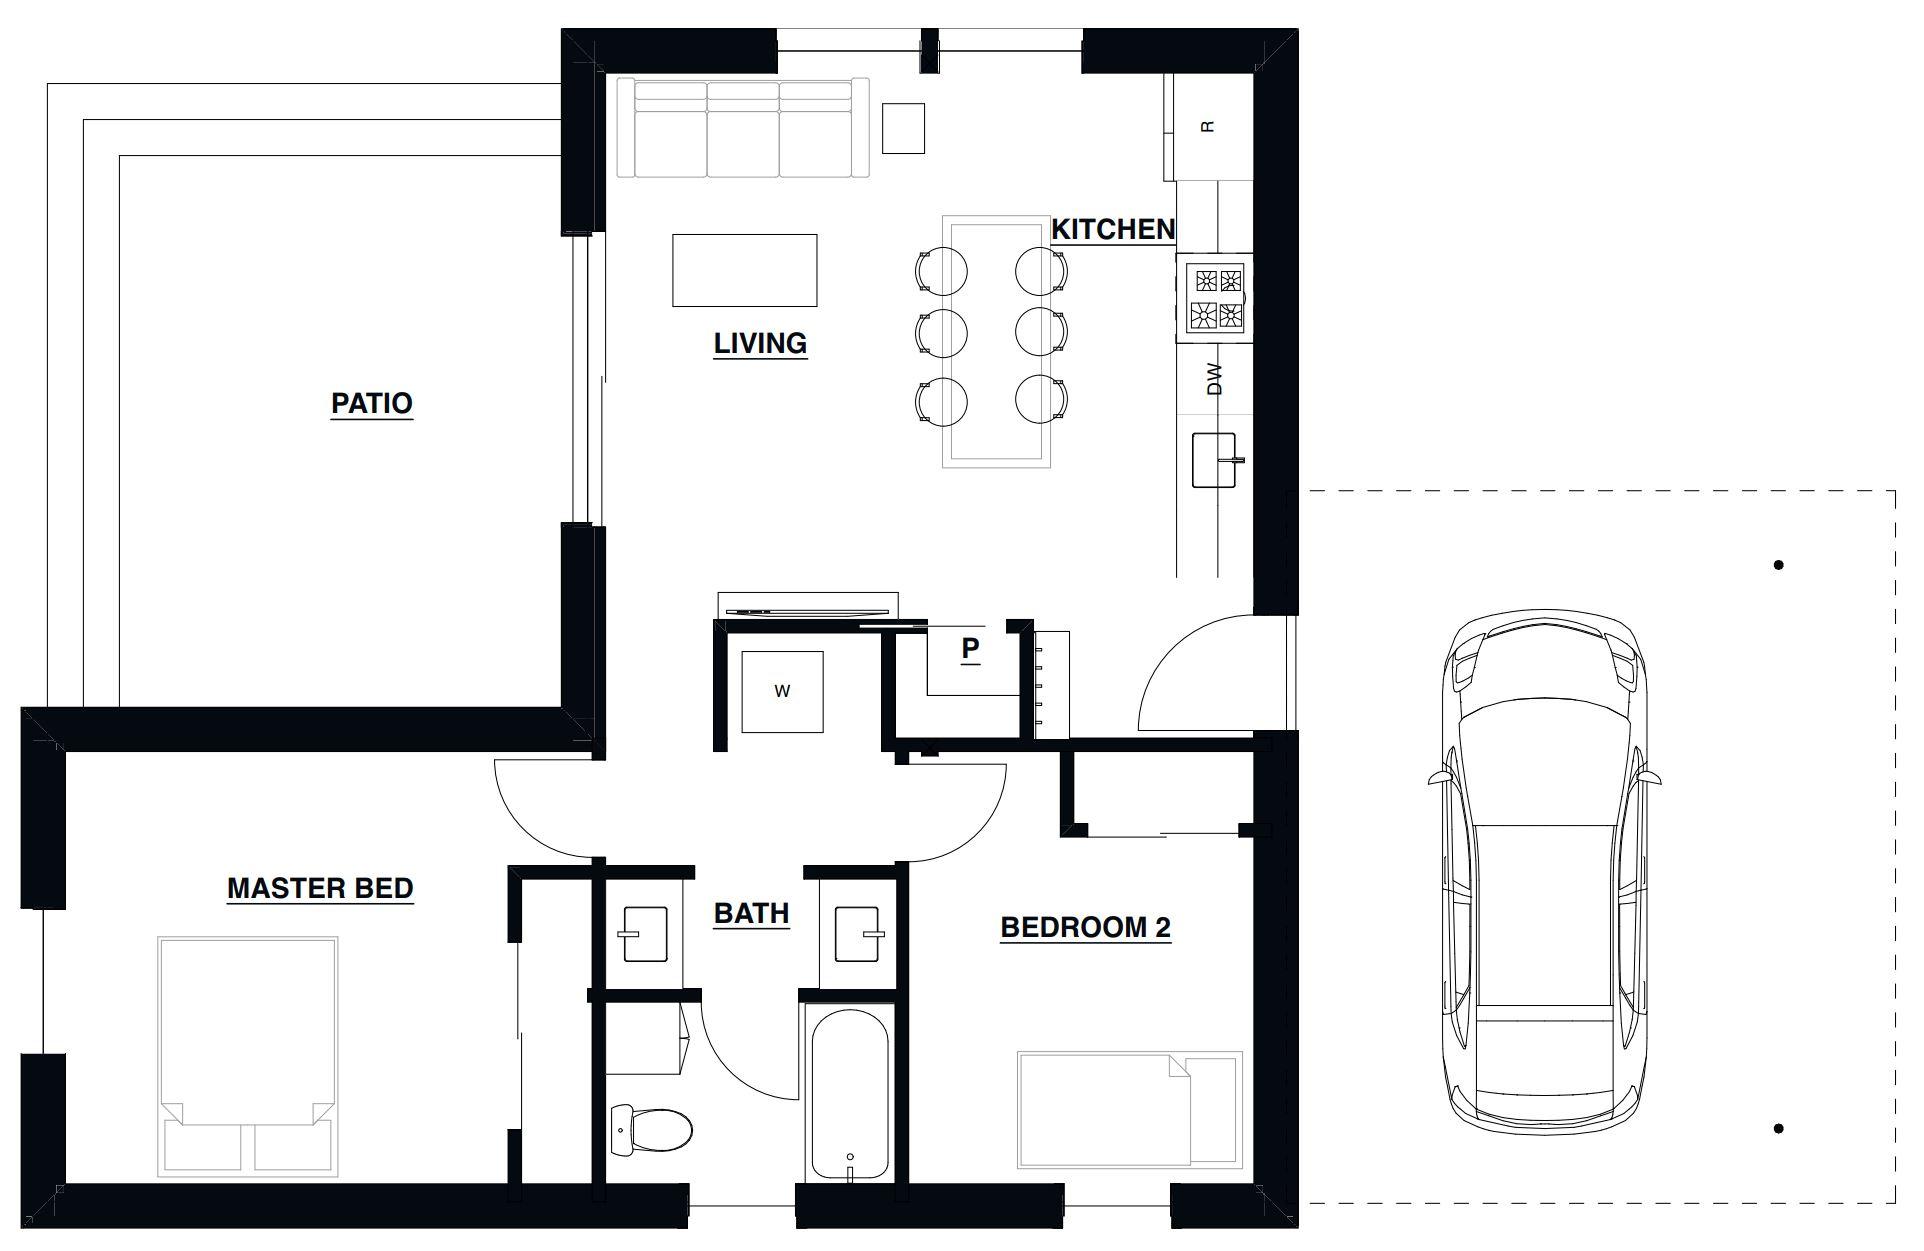 Small Haus Small 800 Floorplan